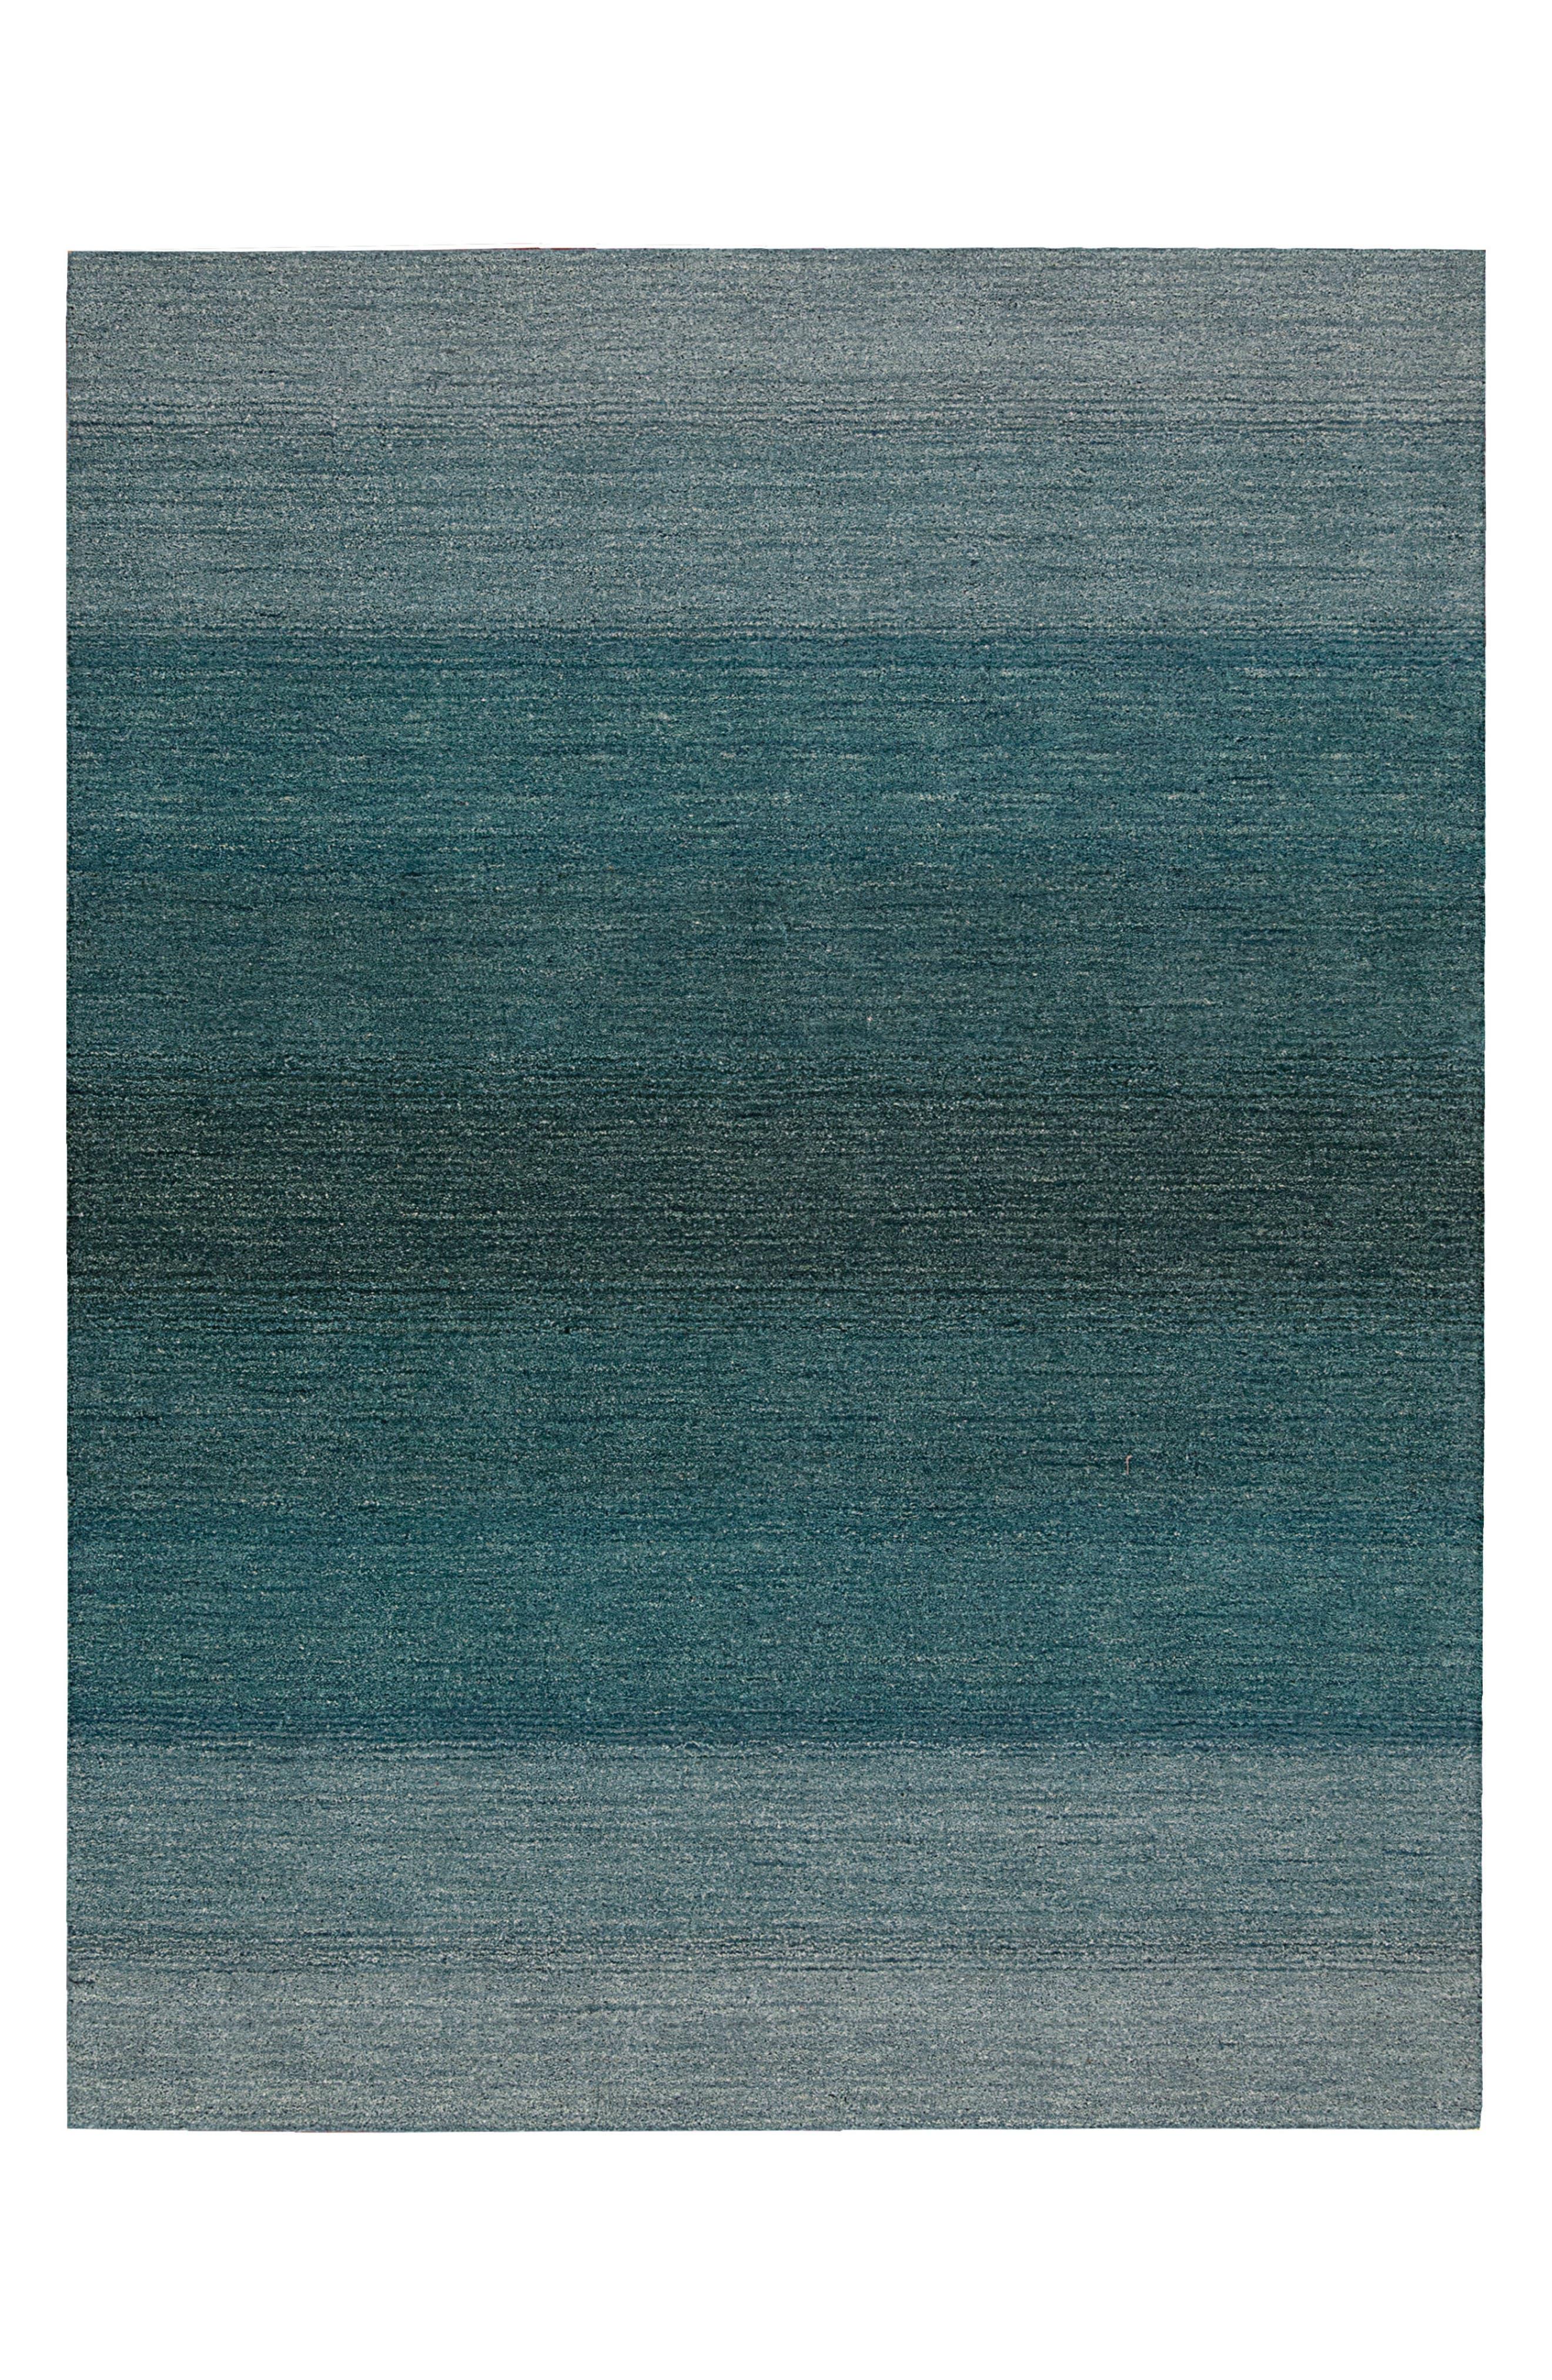 Main Image - Calvin Klein Linear Glow Wool Rug